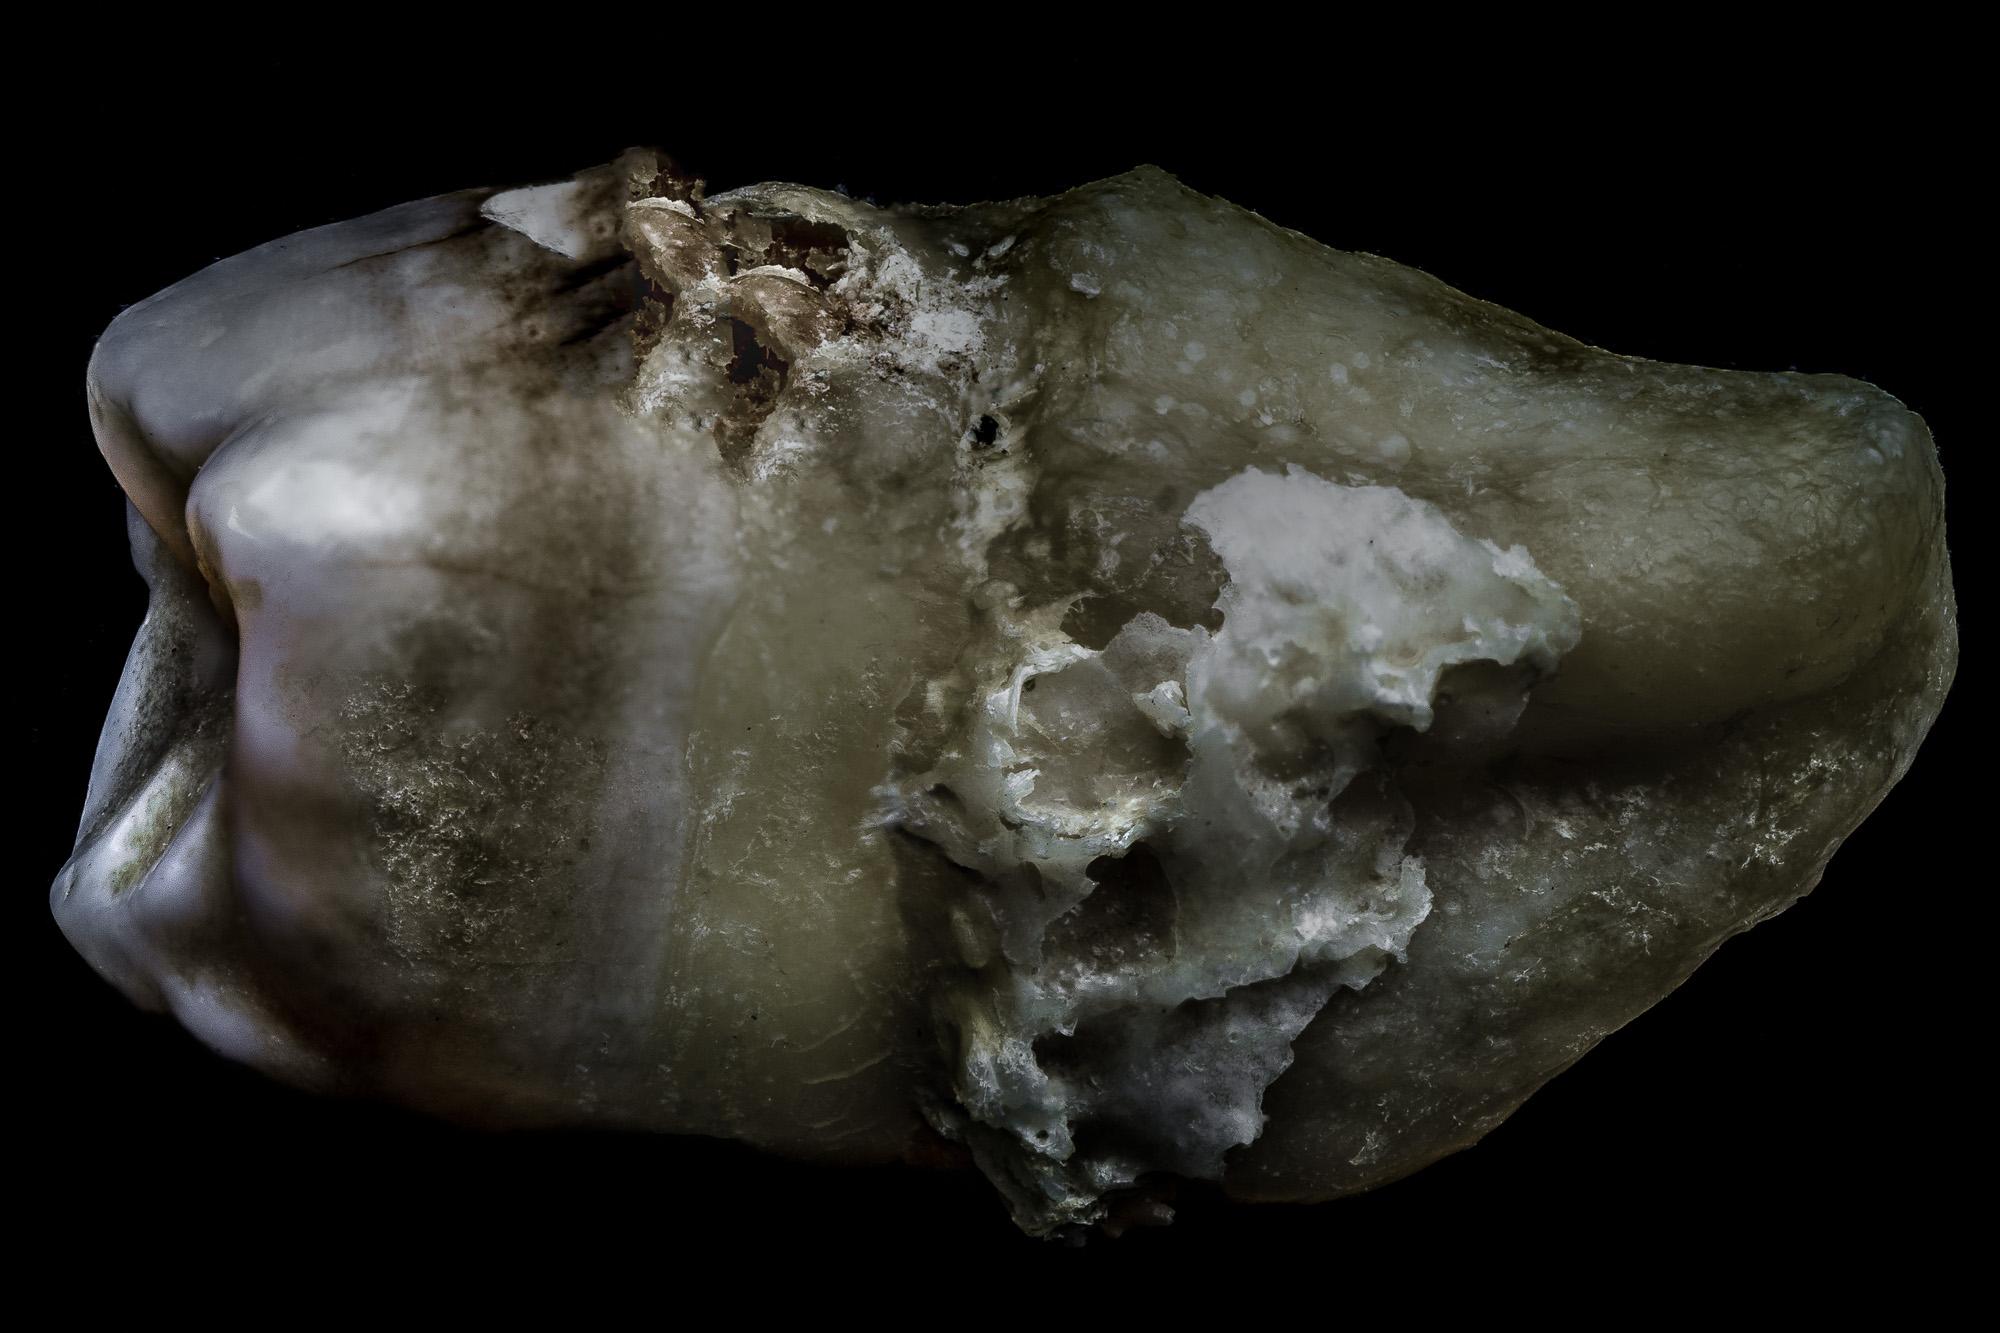 neal-auch-human-teeth-photographs-2.jpg